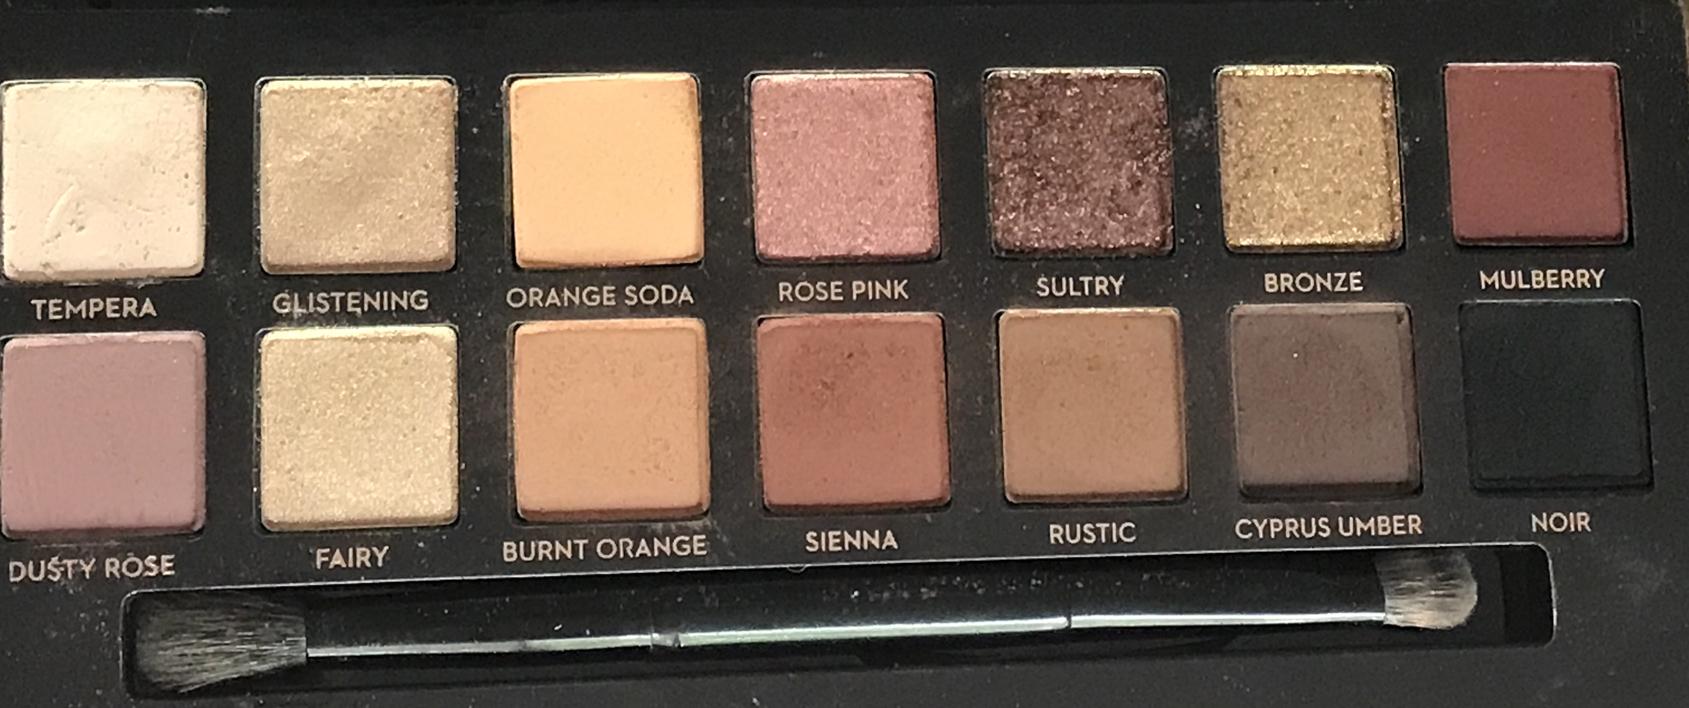 Anastasia Beverly Hills Soft Glam Shades